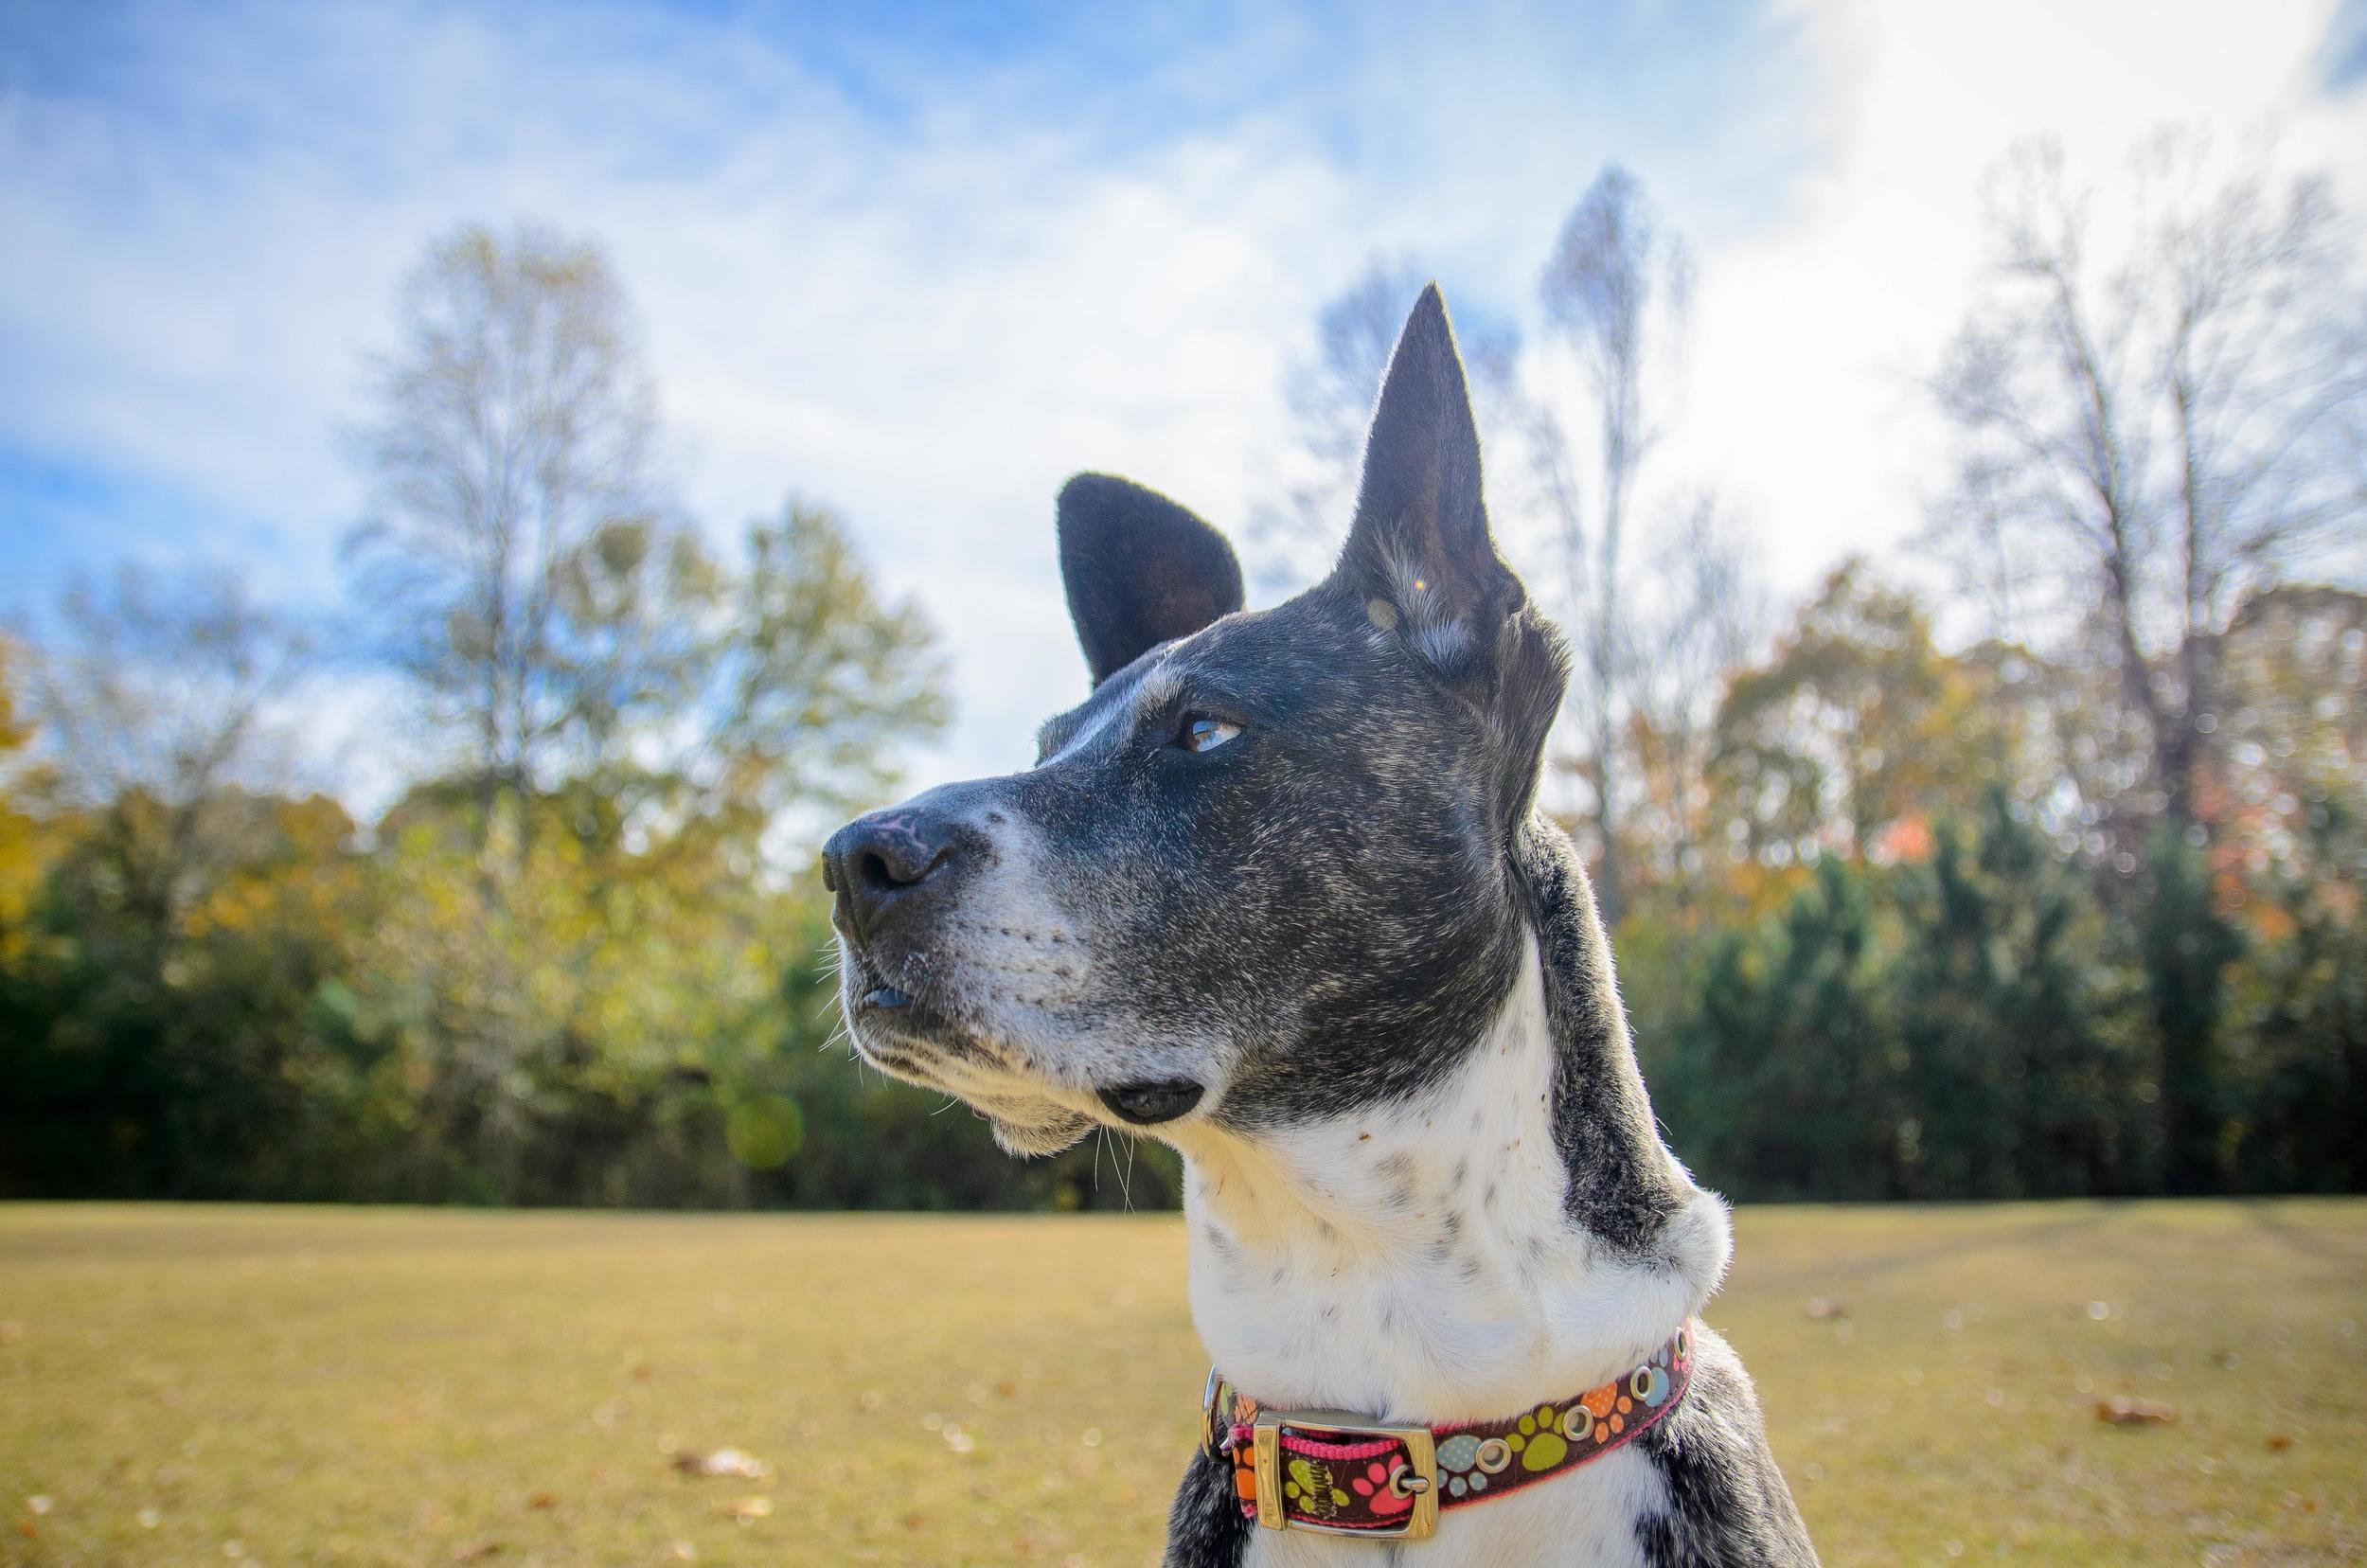 Dog_walking_in_Atlanta_Decatur.jpg